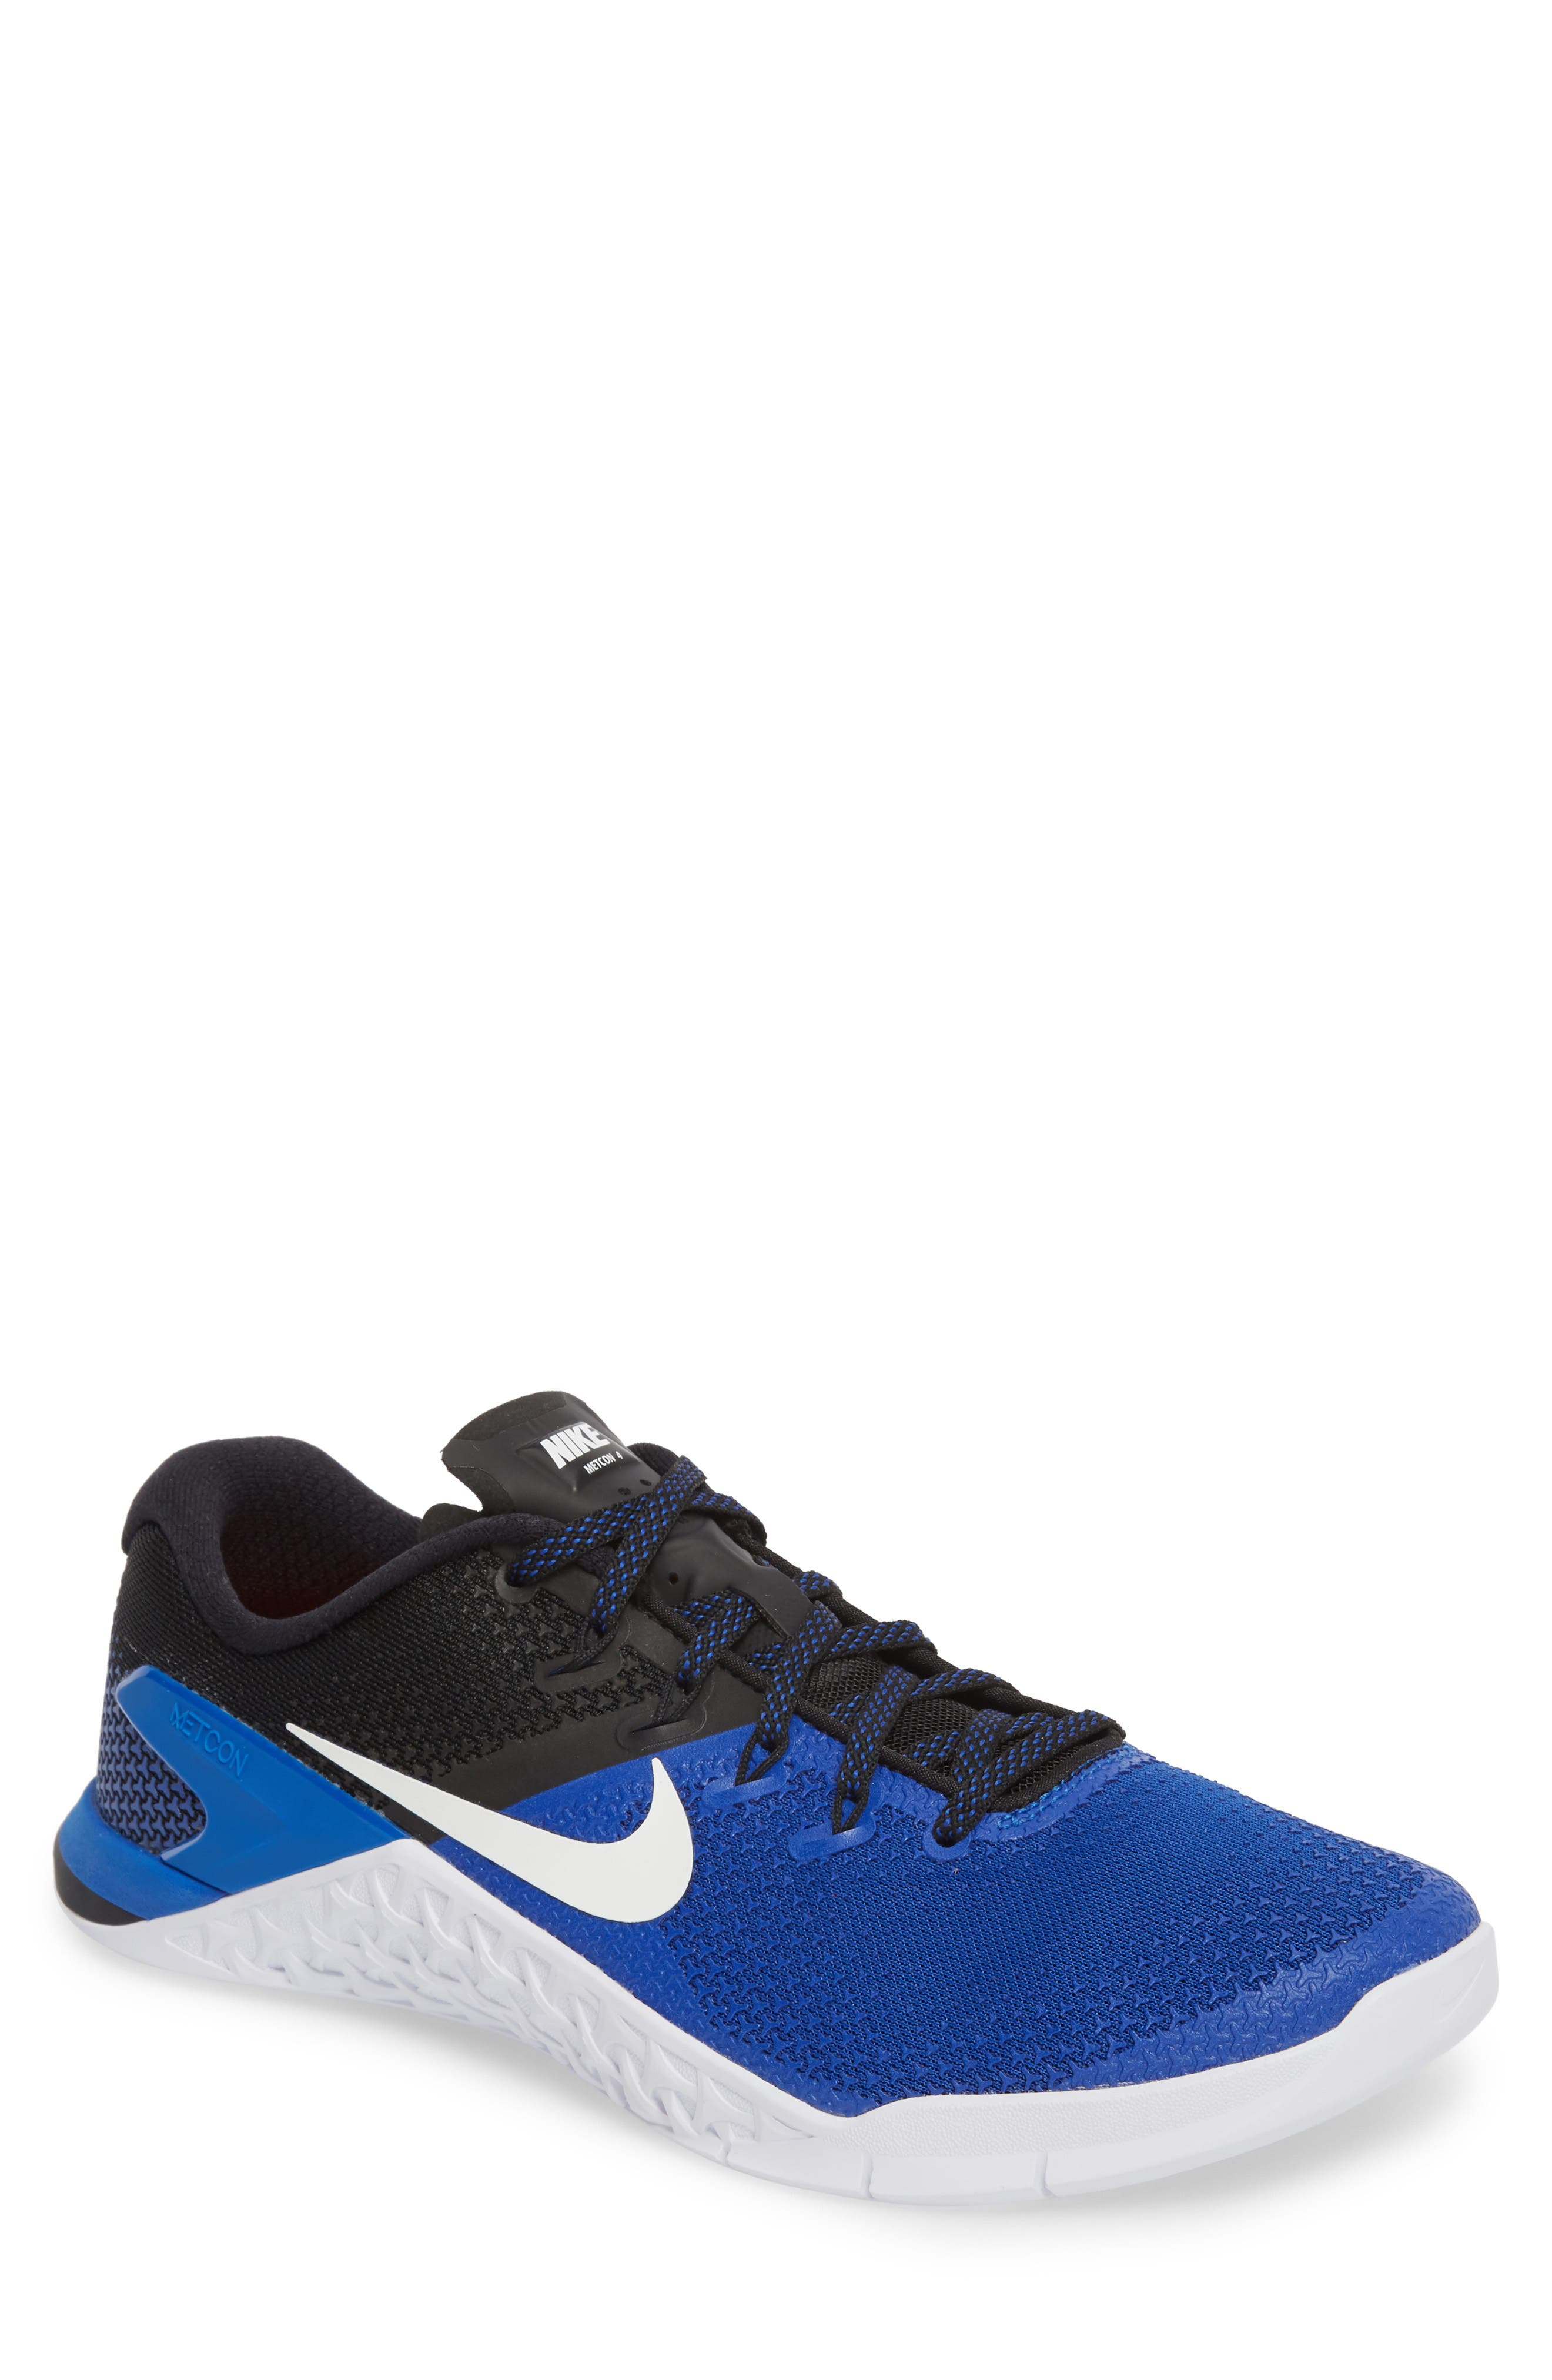 Nike Metcon 4 Training Shoe (Men)